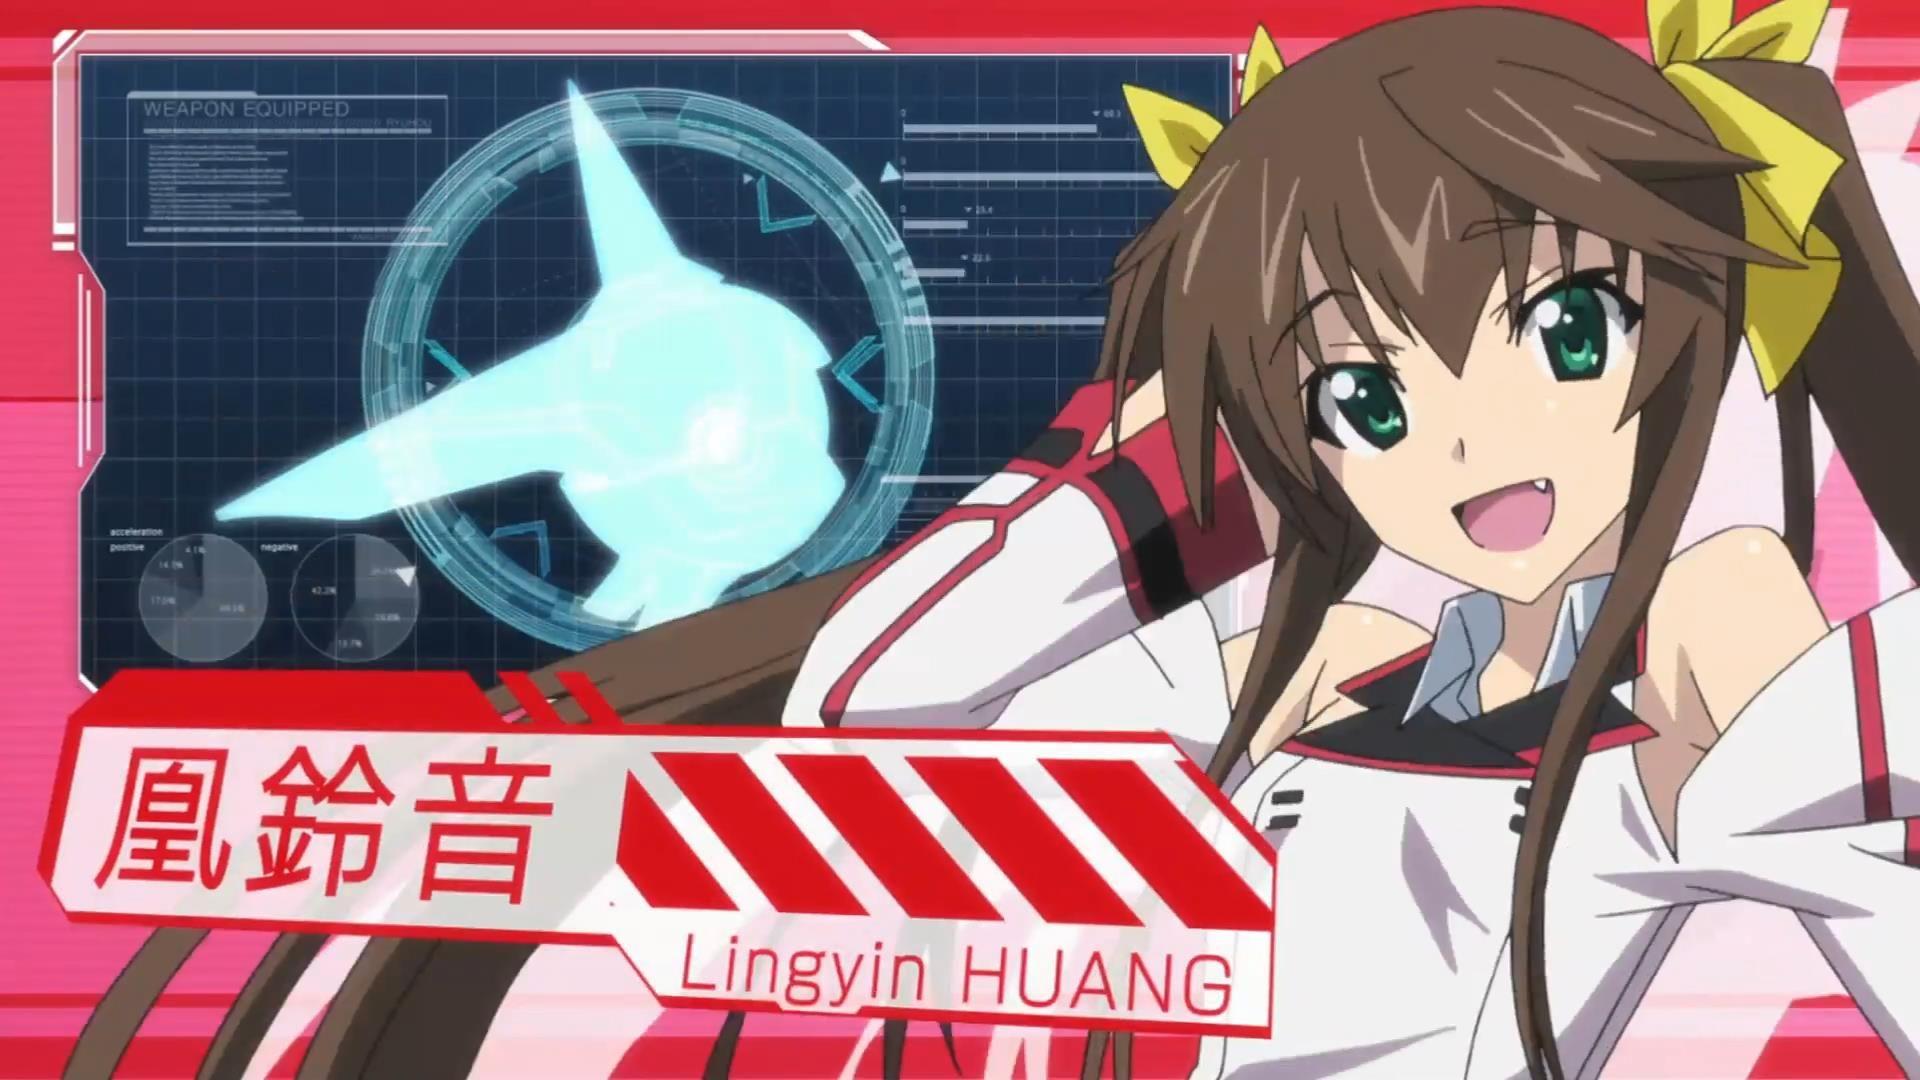 Infinite stratos 2 episode 1 anime episode infinite